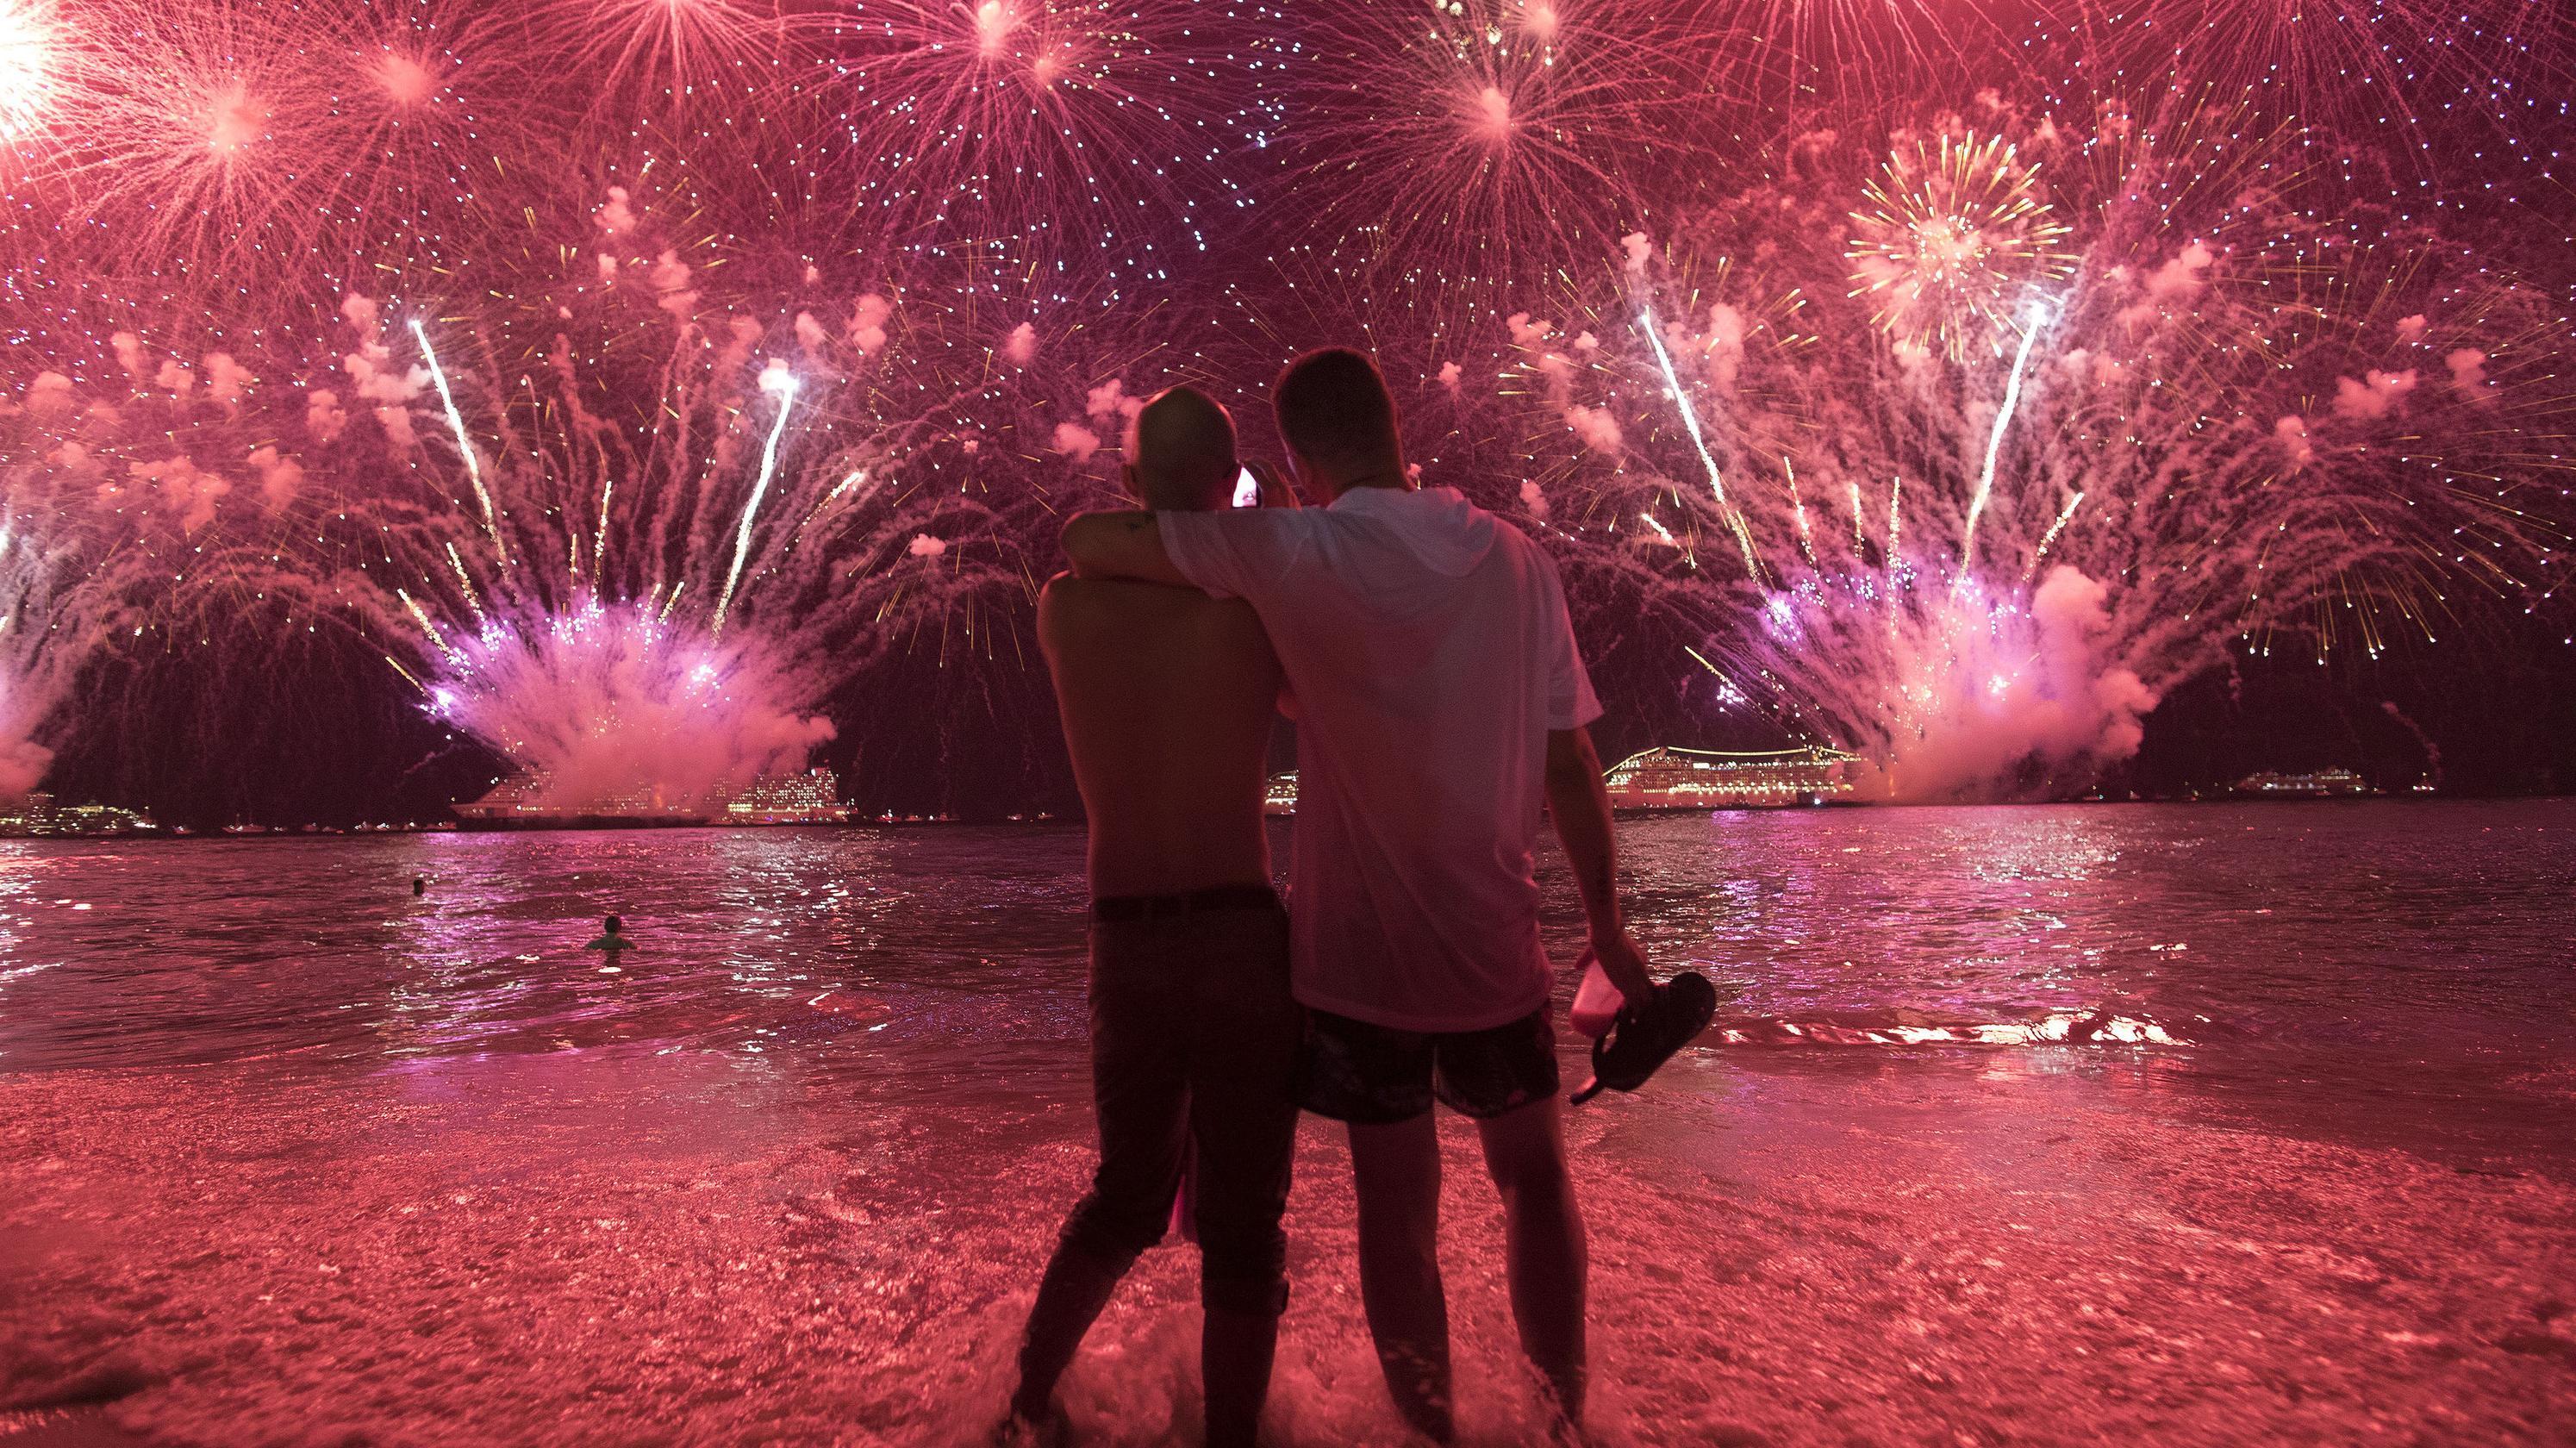 Zwei Männer betrachten das Feuerwerk an der Copa Cabana in Rio den Janeiro.